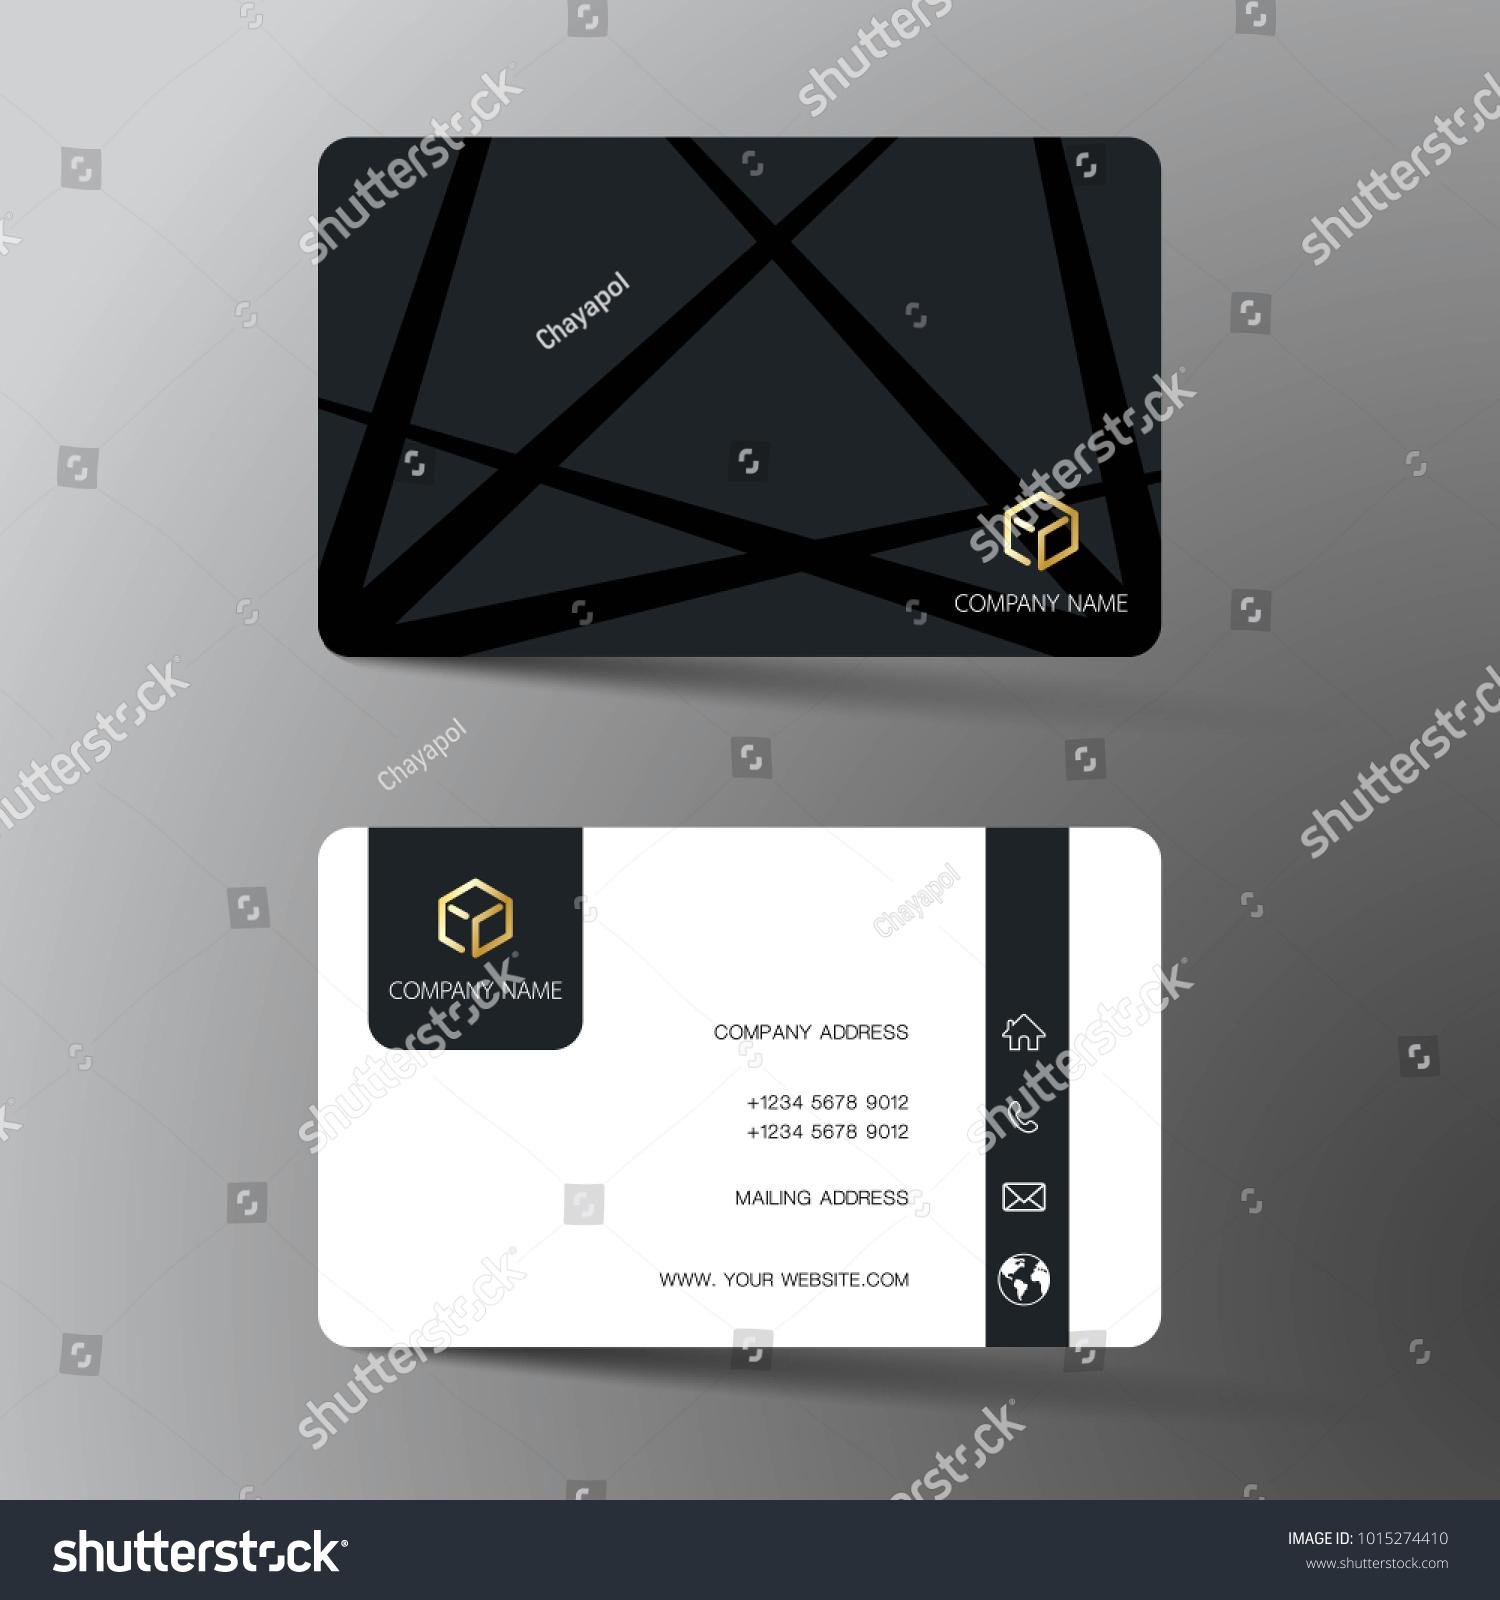 modern business card template design inspiration のベクター画像素材